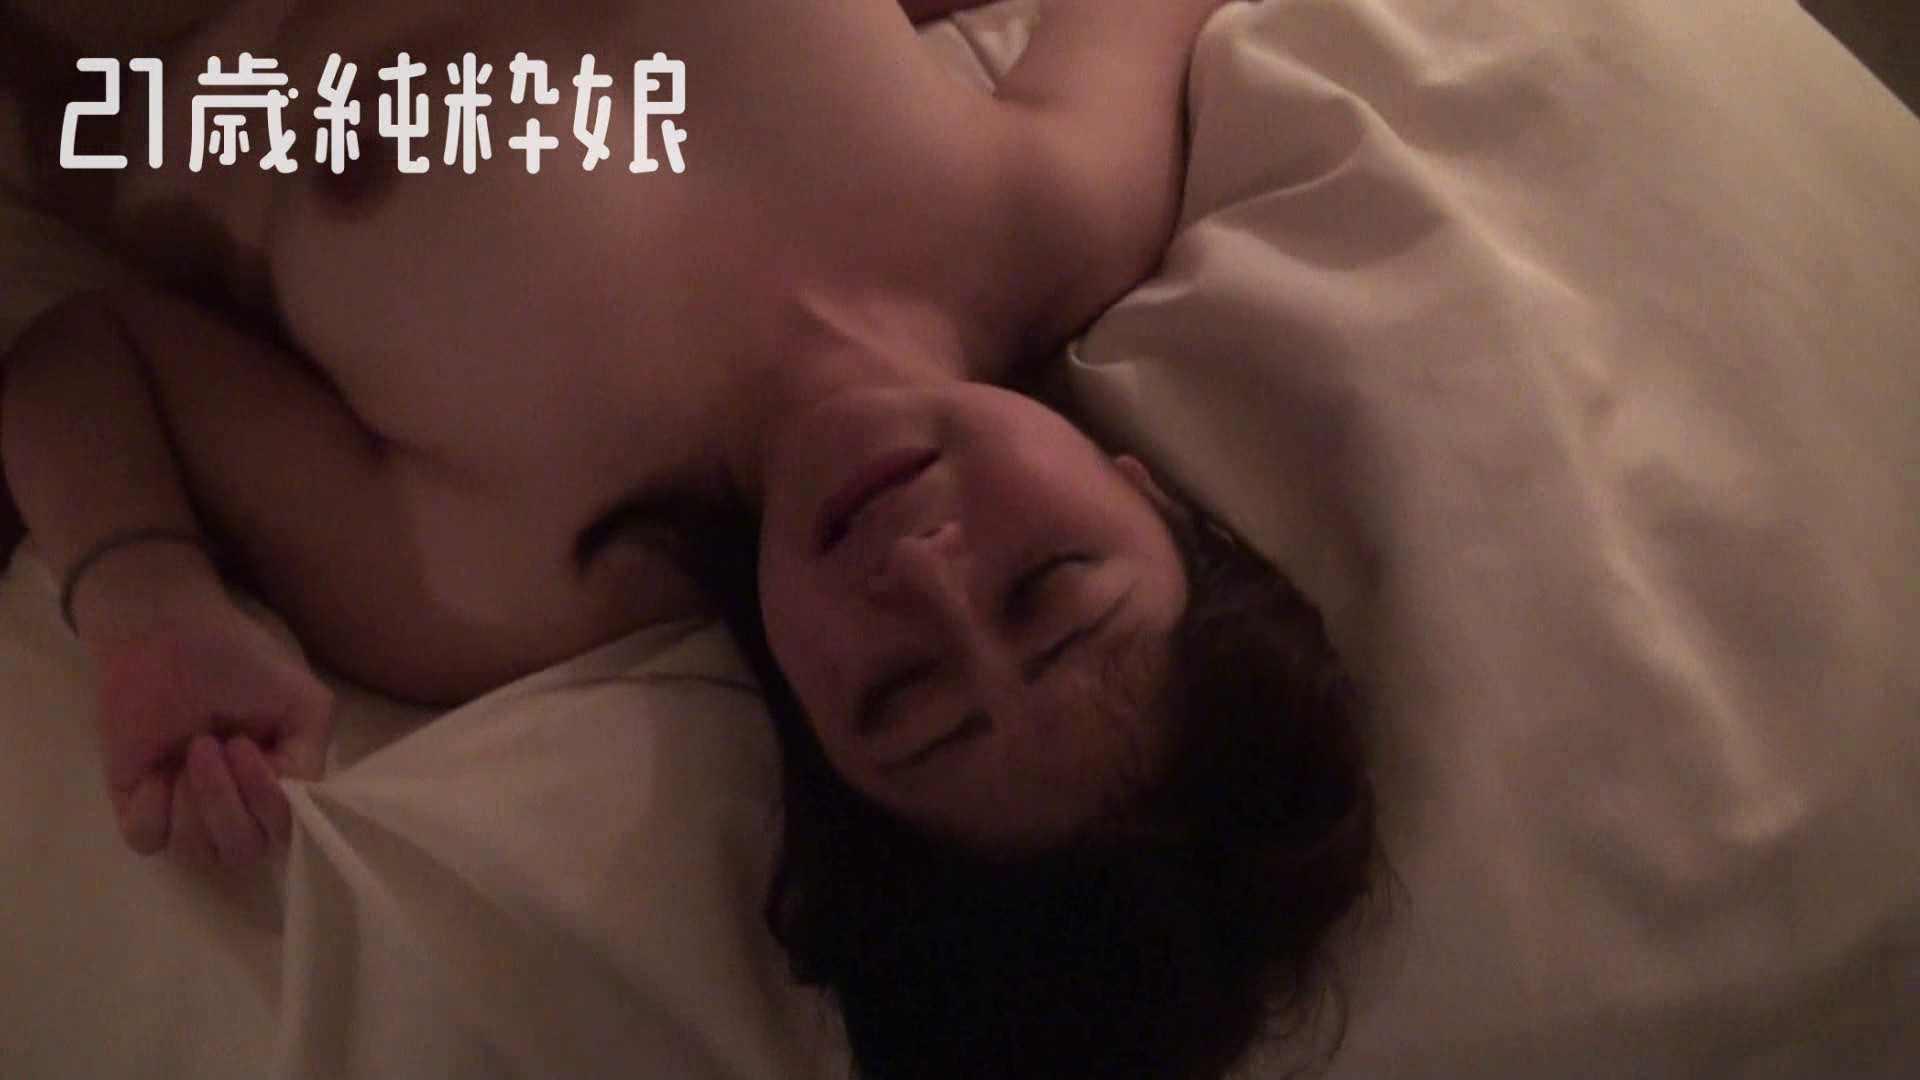 Gカップ21歳純粋嬢第2弾Vol.4 OLのエロ生活  88連発 75